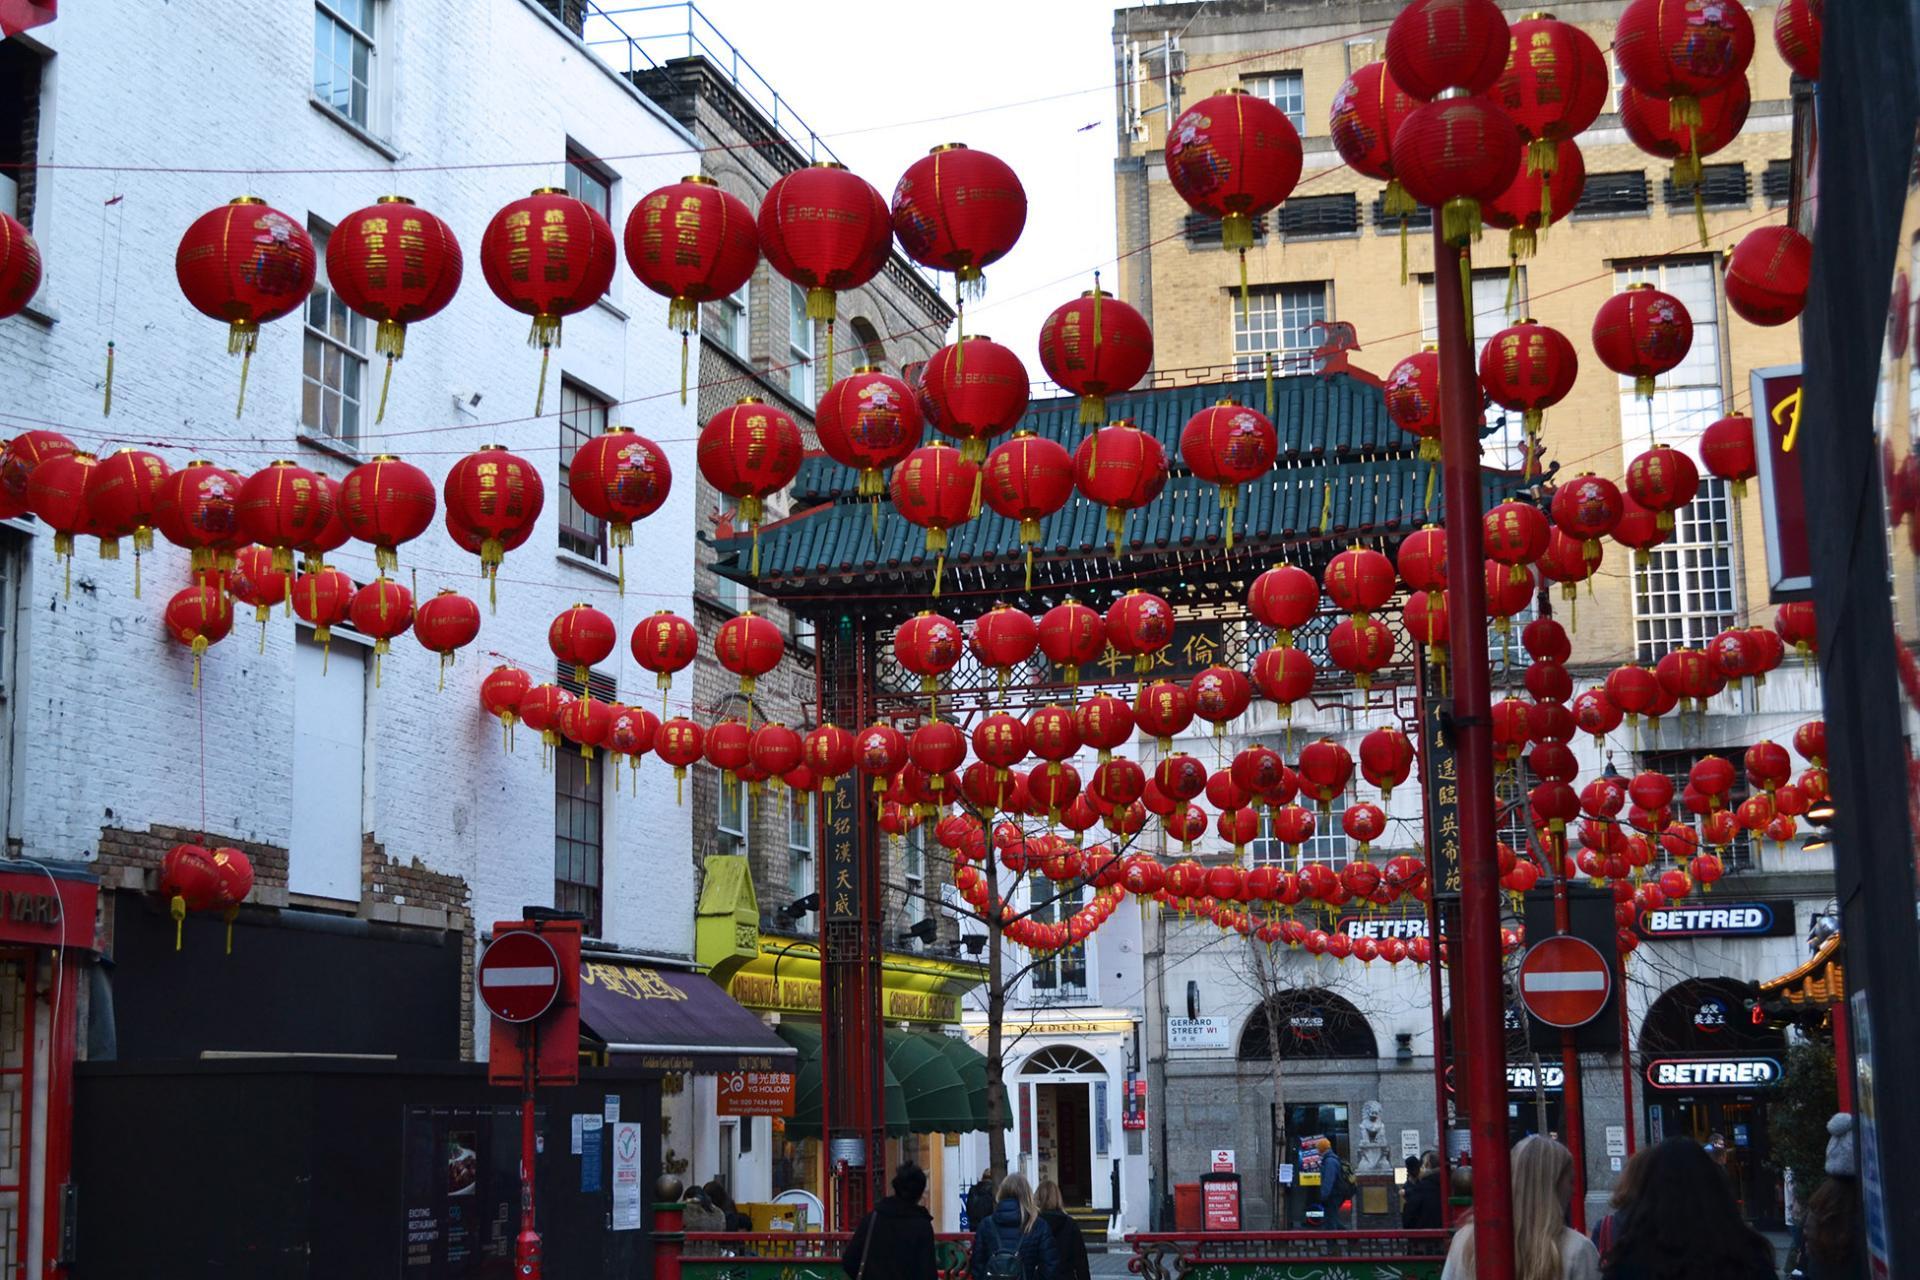 Gerrard Street en Chinatown, Londres